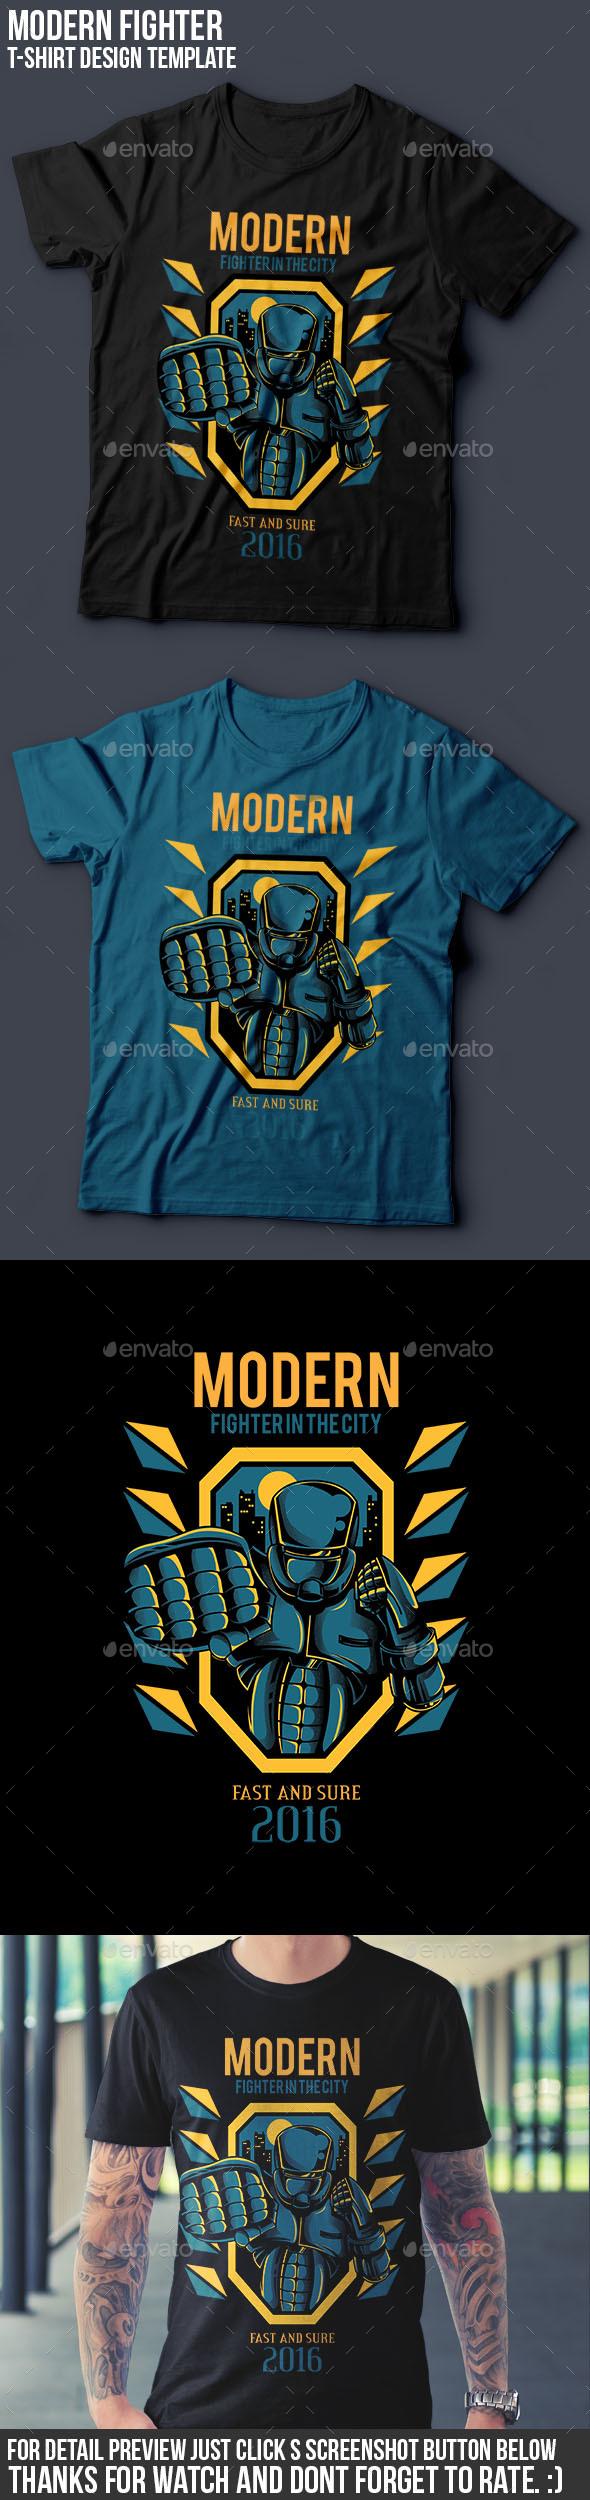 Modern Fighter T-Shirt Design - Sports & Teams T-Shirts